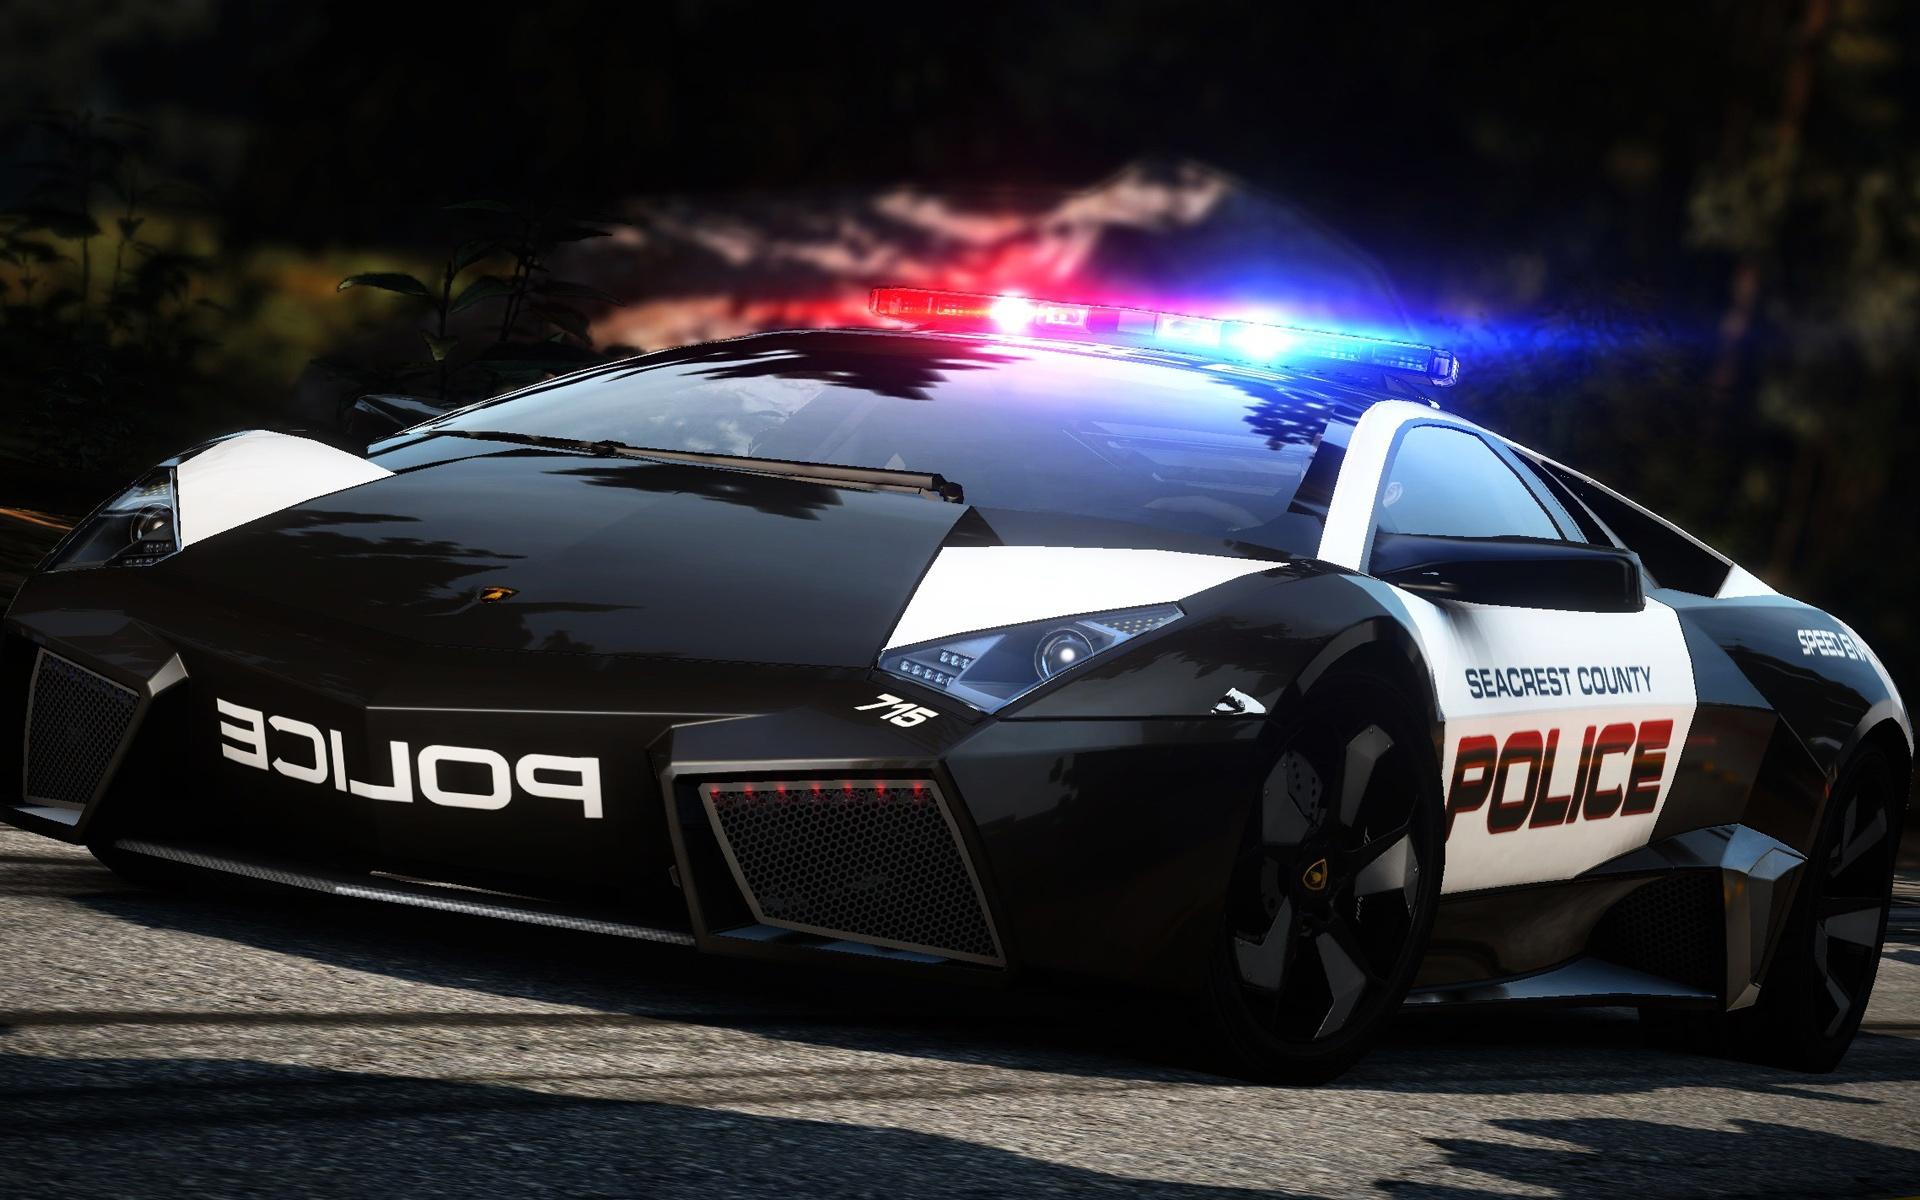 Lamborghini Reventon Lamborghini Police Car Cars 1920x1200